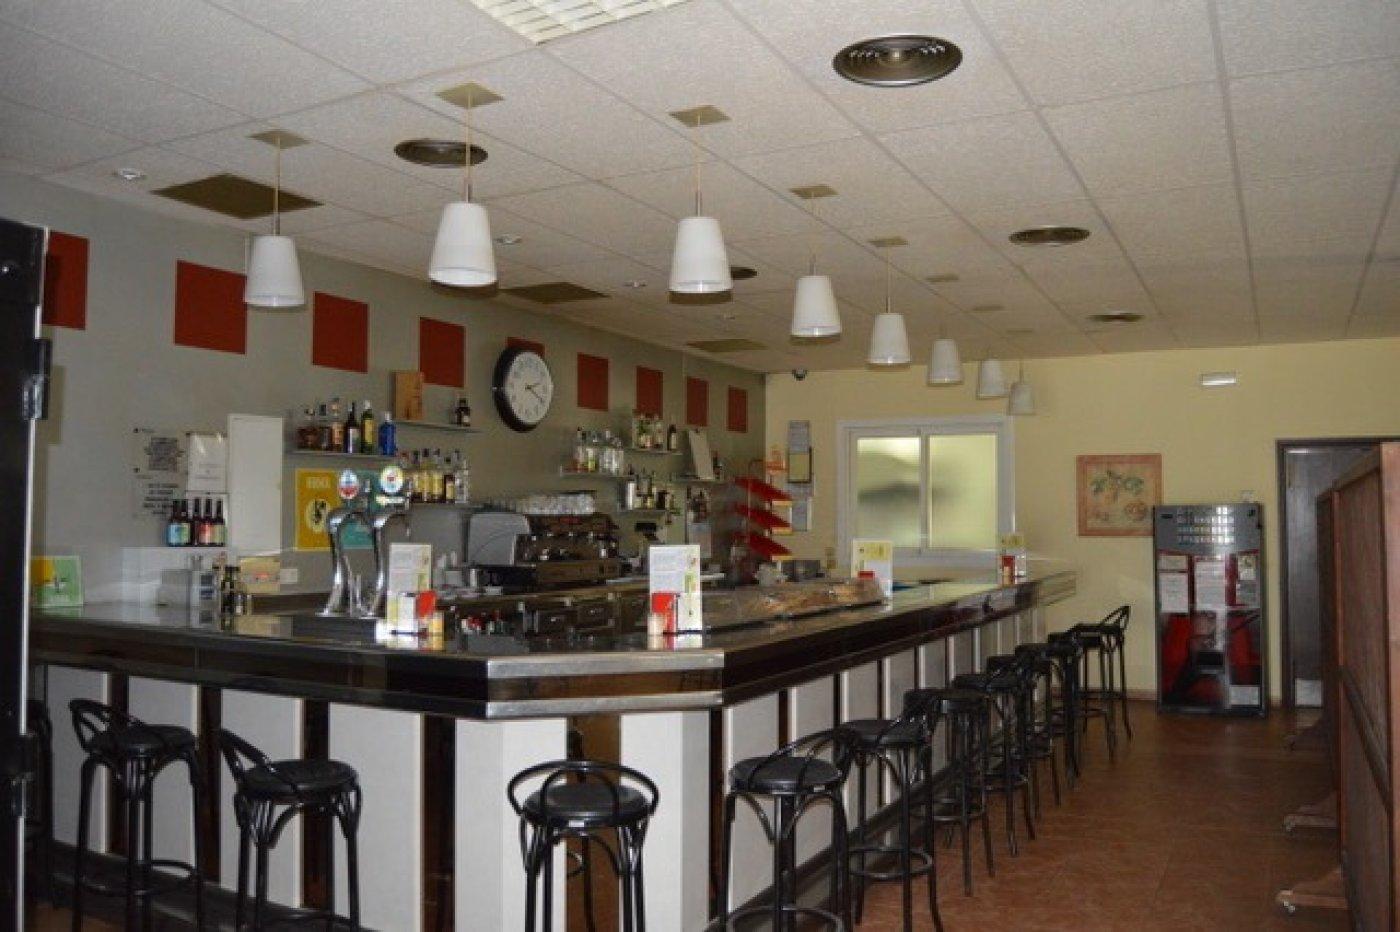 Nave restaurante en polígono cerca de sant sadurní d´anoia - imagenInmueble21